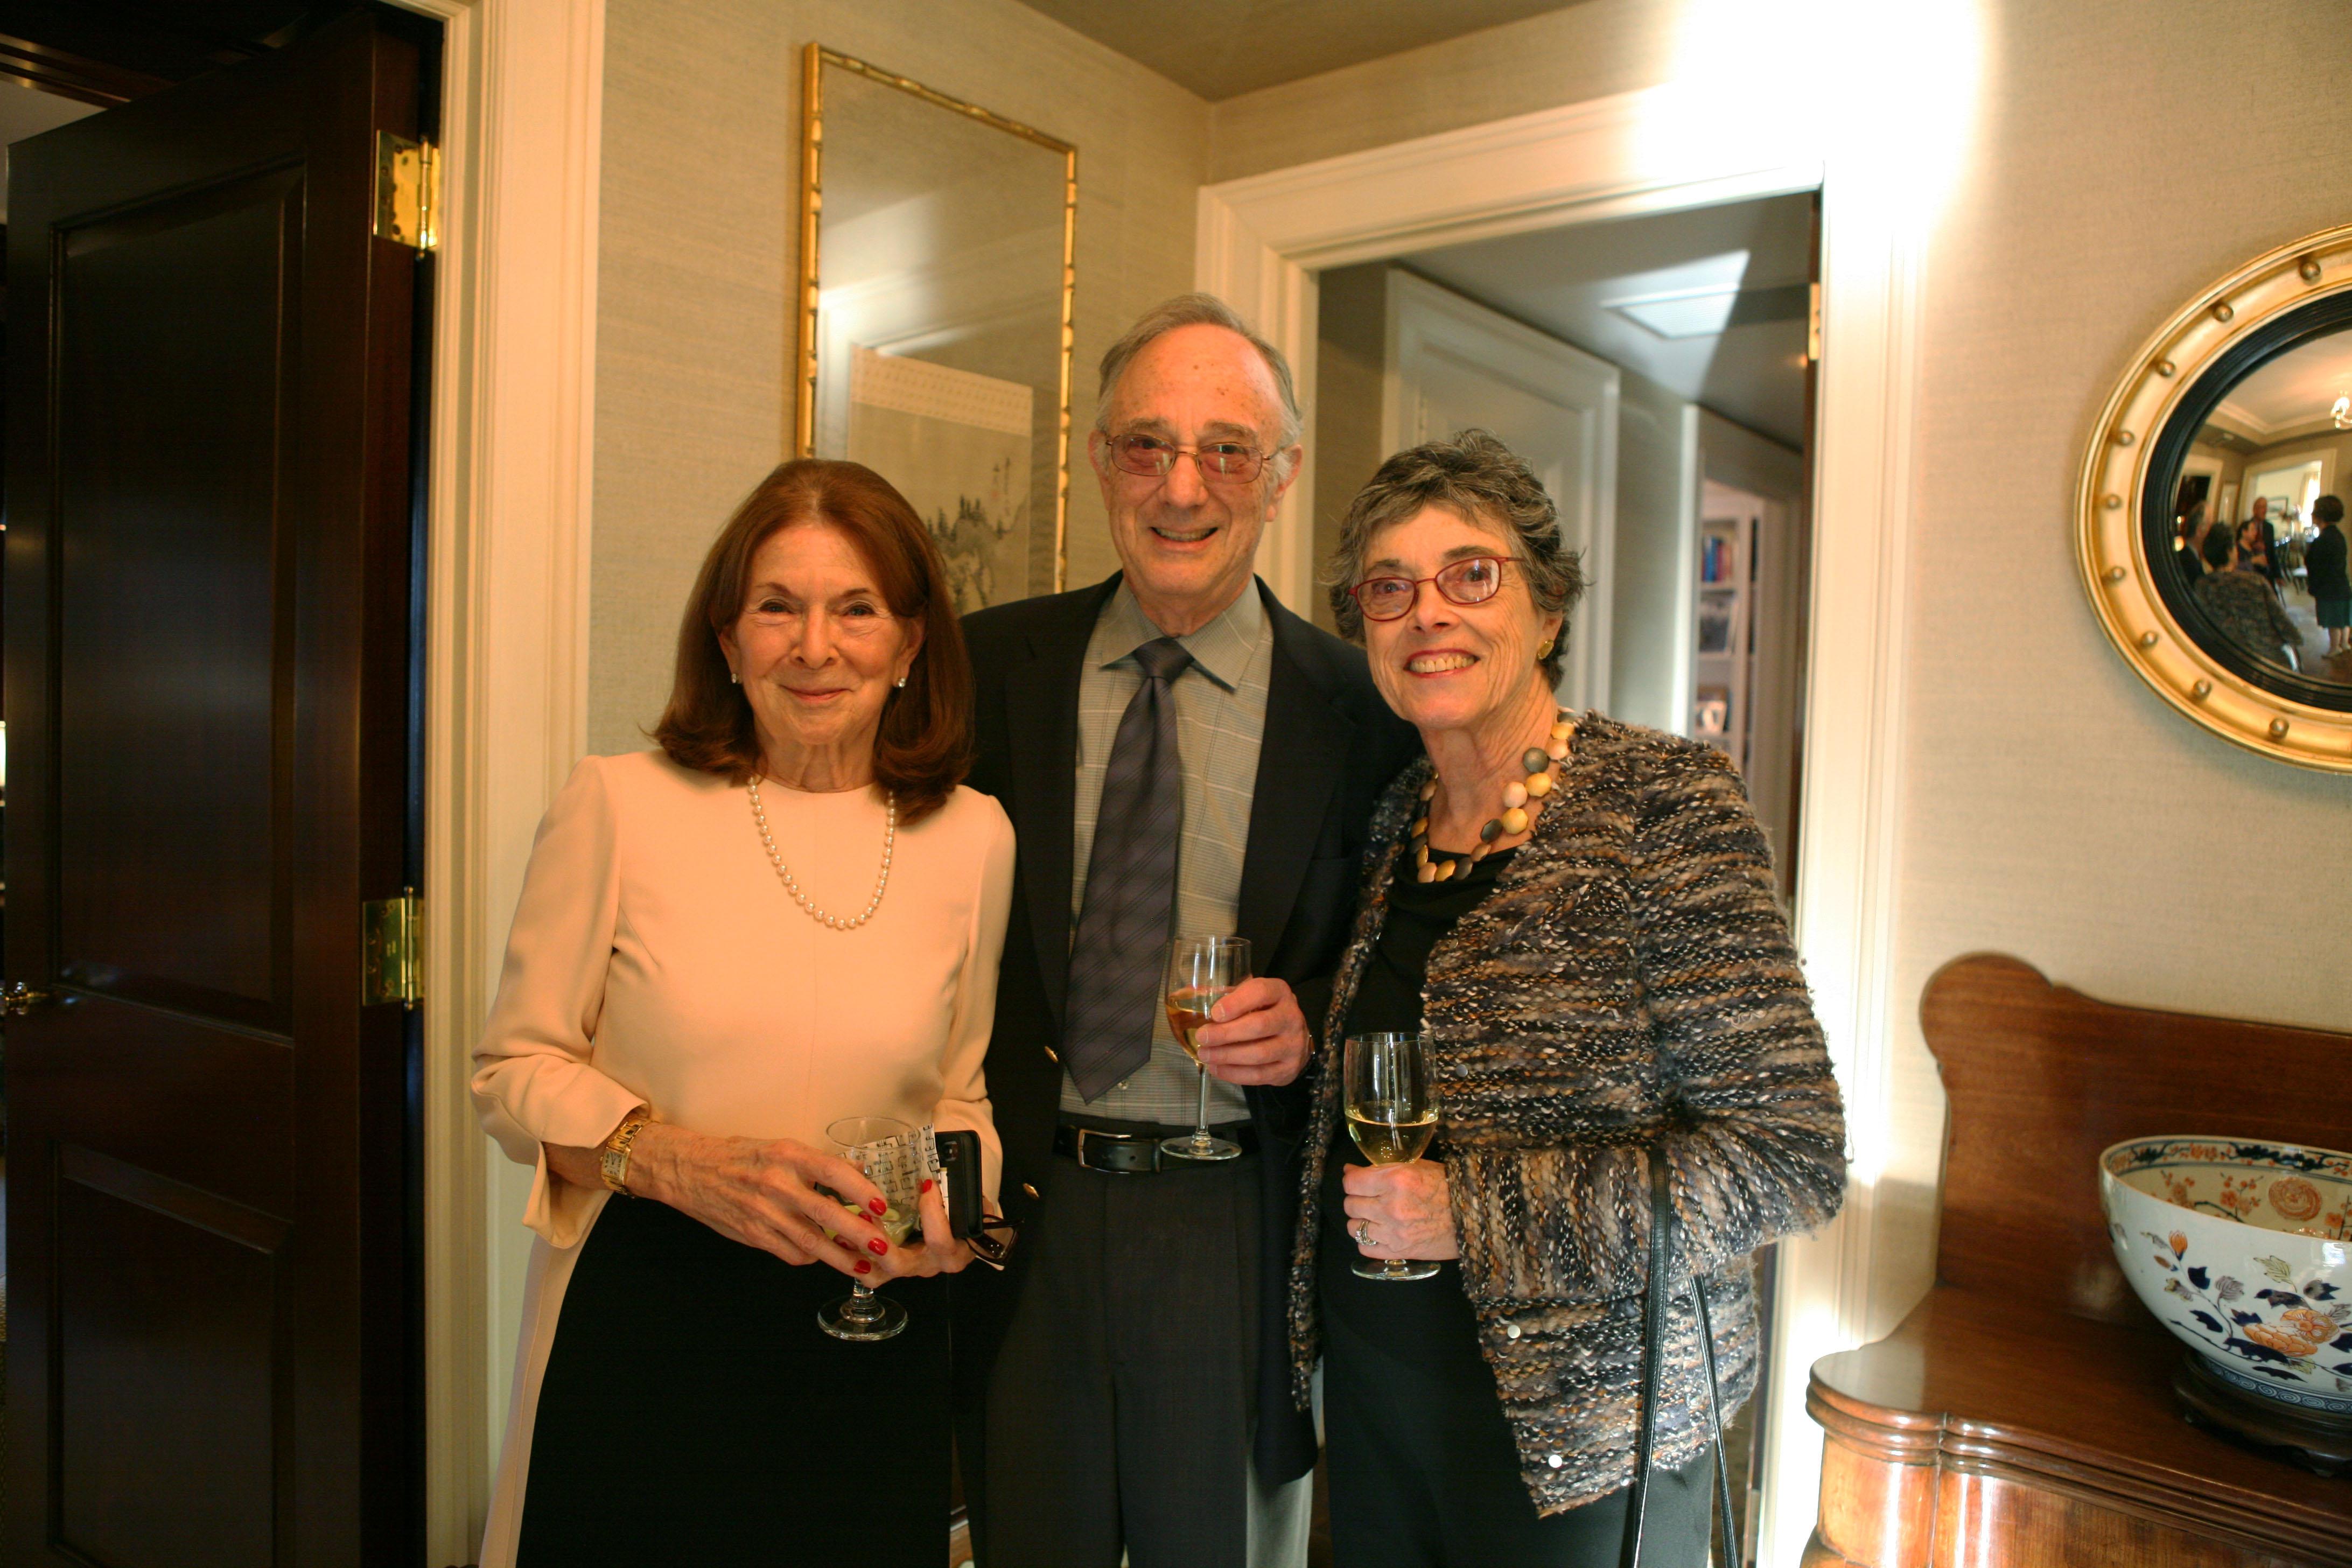 Priscilla Kauff, Jonathan Brezin, Global Council member Linda Keen